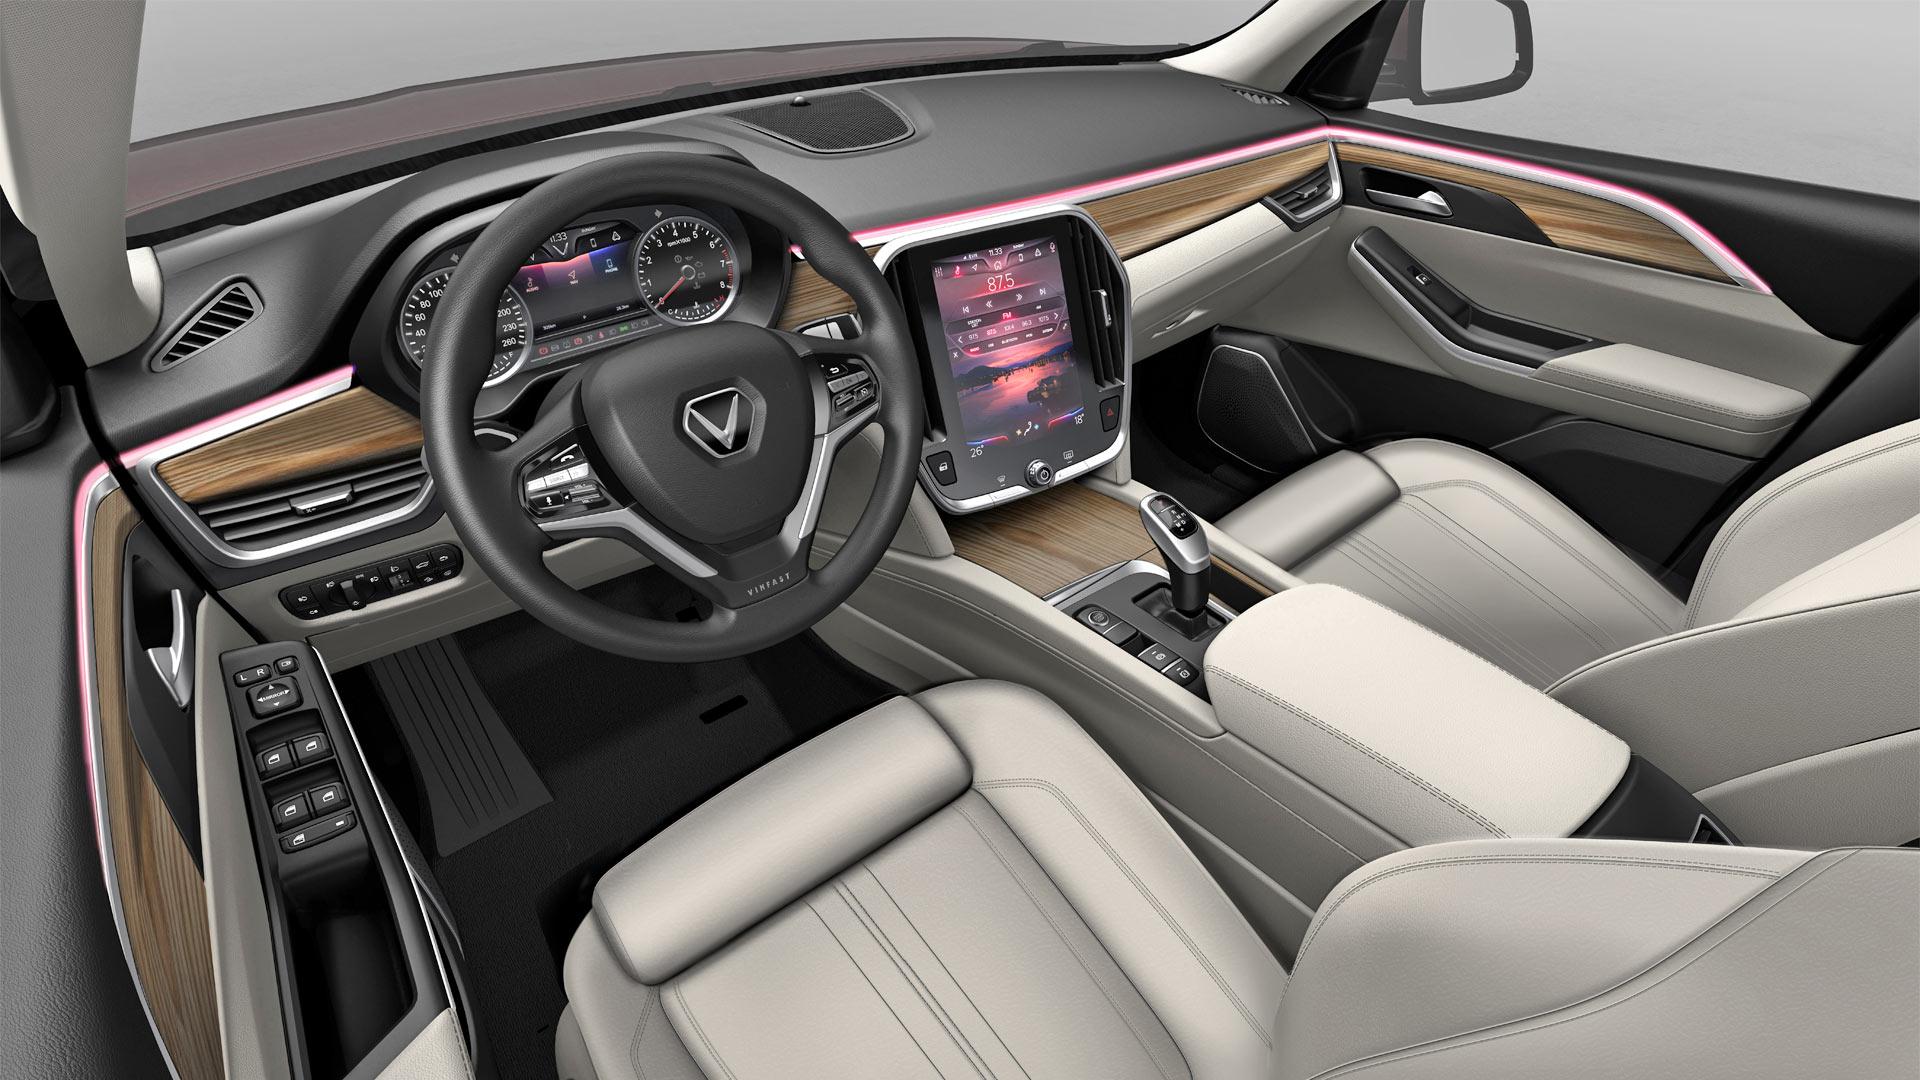 VinFast-LUX-SA2.0-Interior